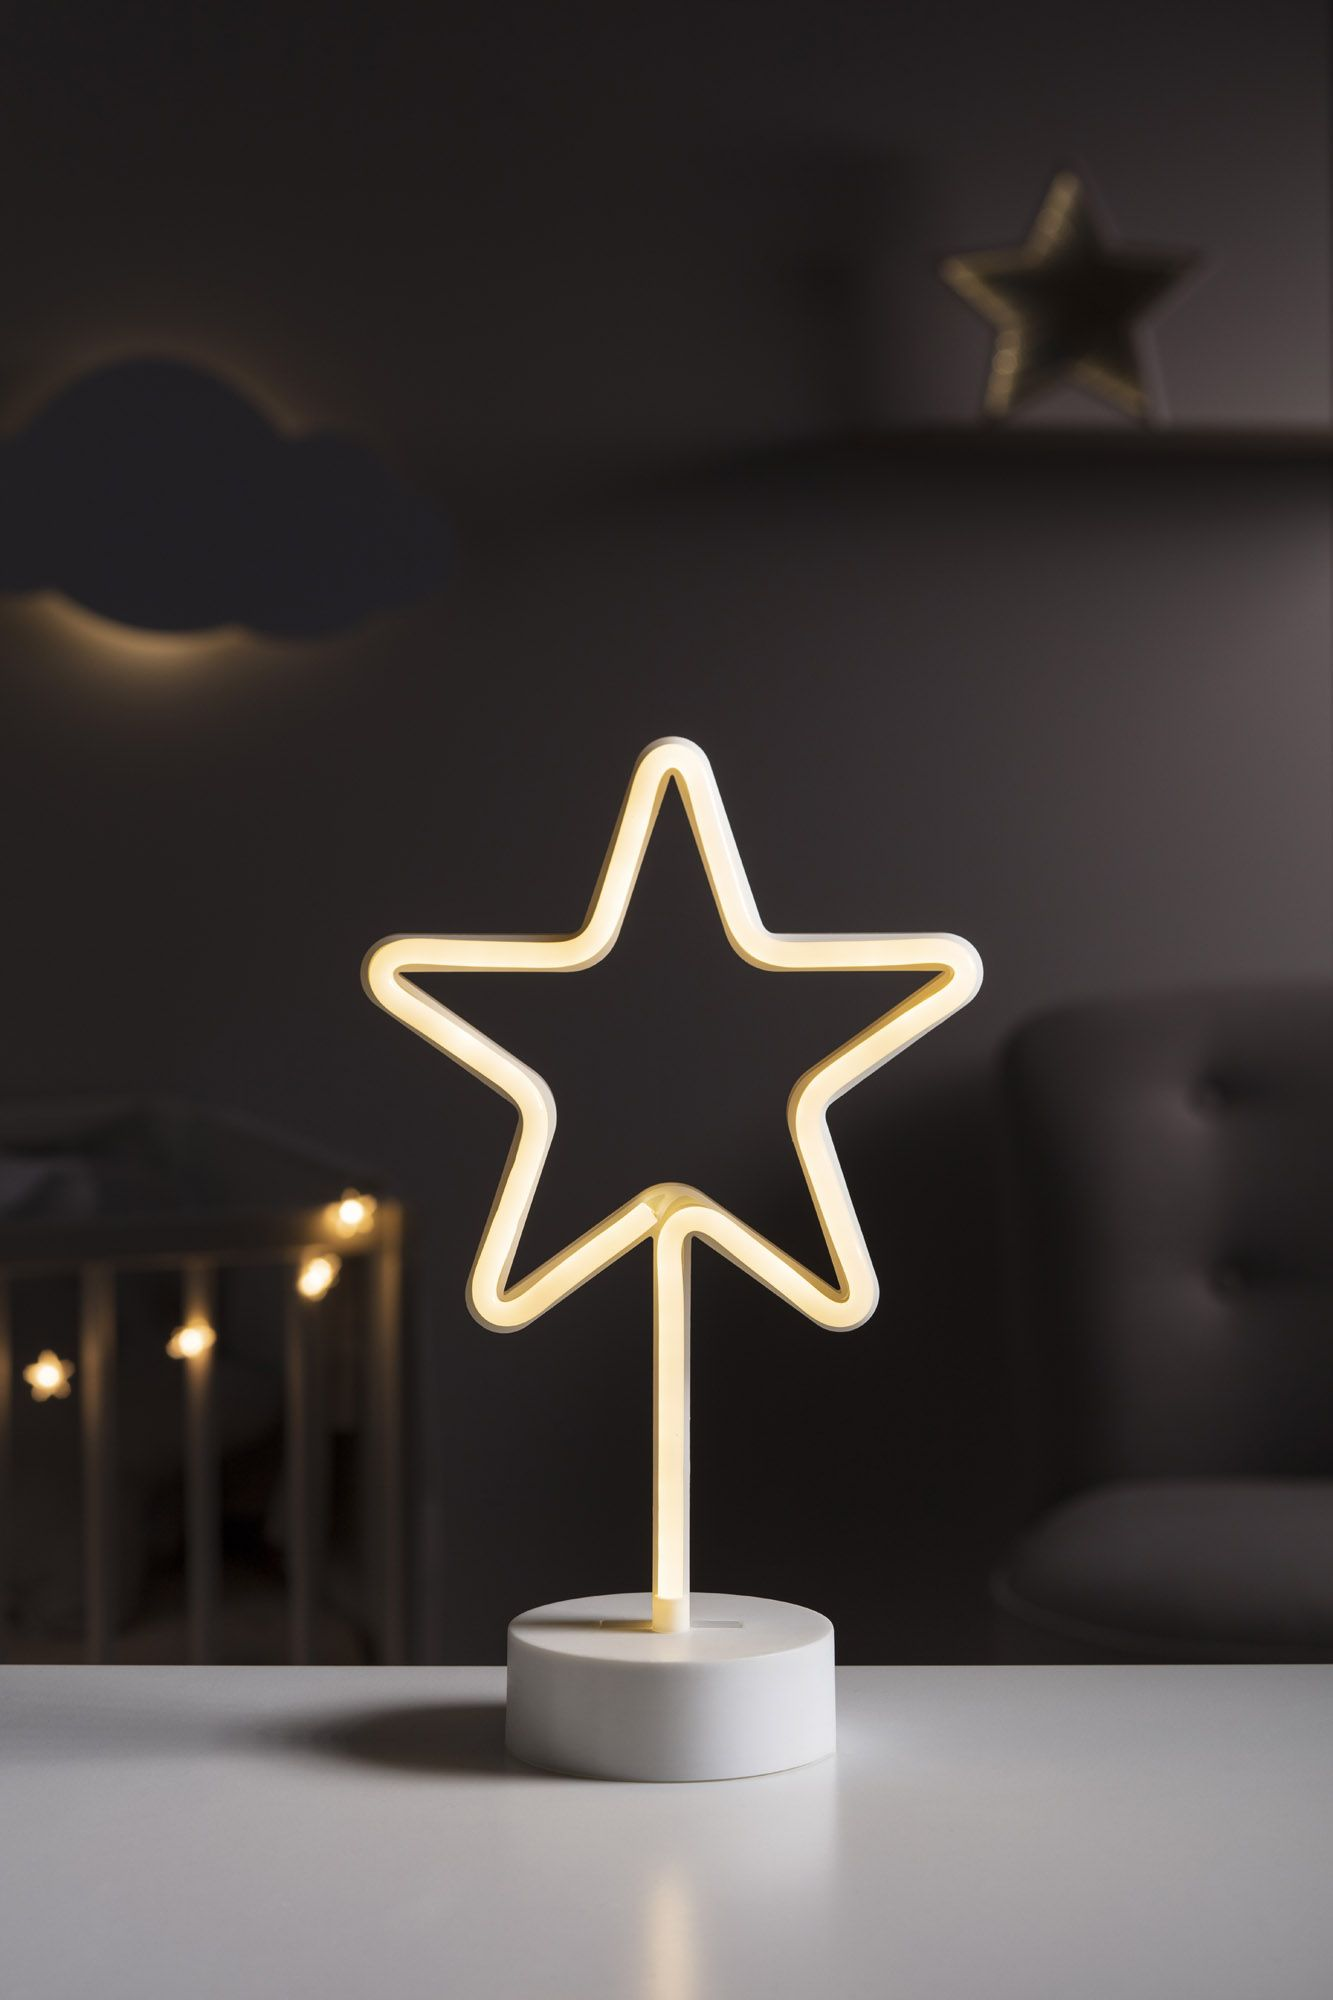 Neon Table Light: Battery Star Table Top Neon Light